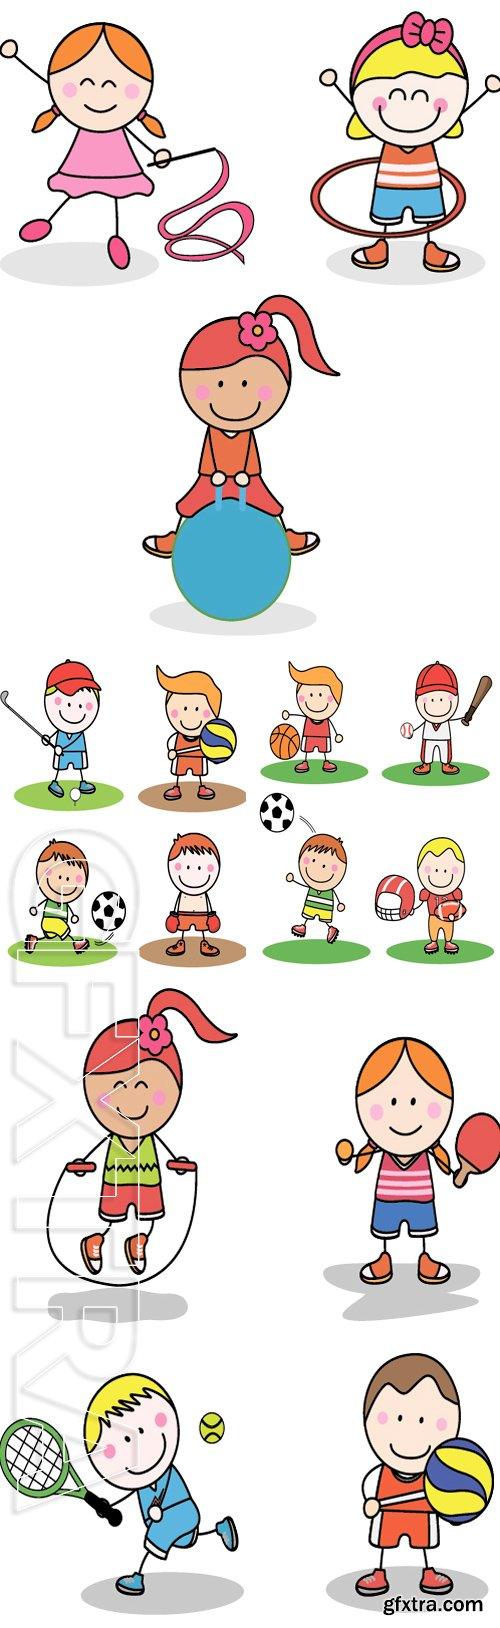 Stock Vectors - Kids sport collection